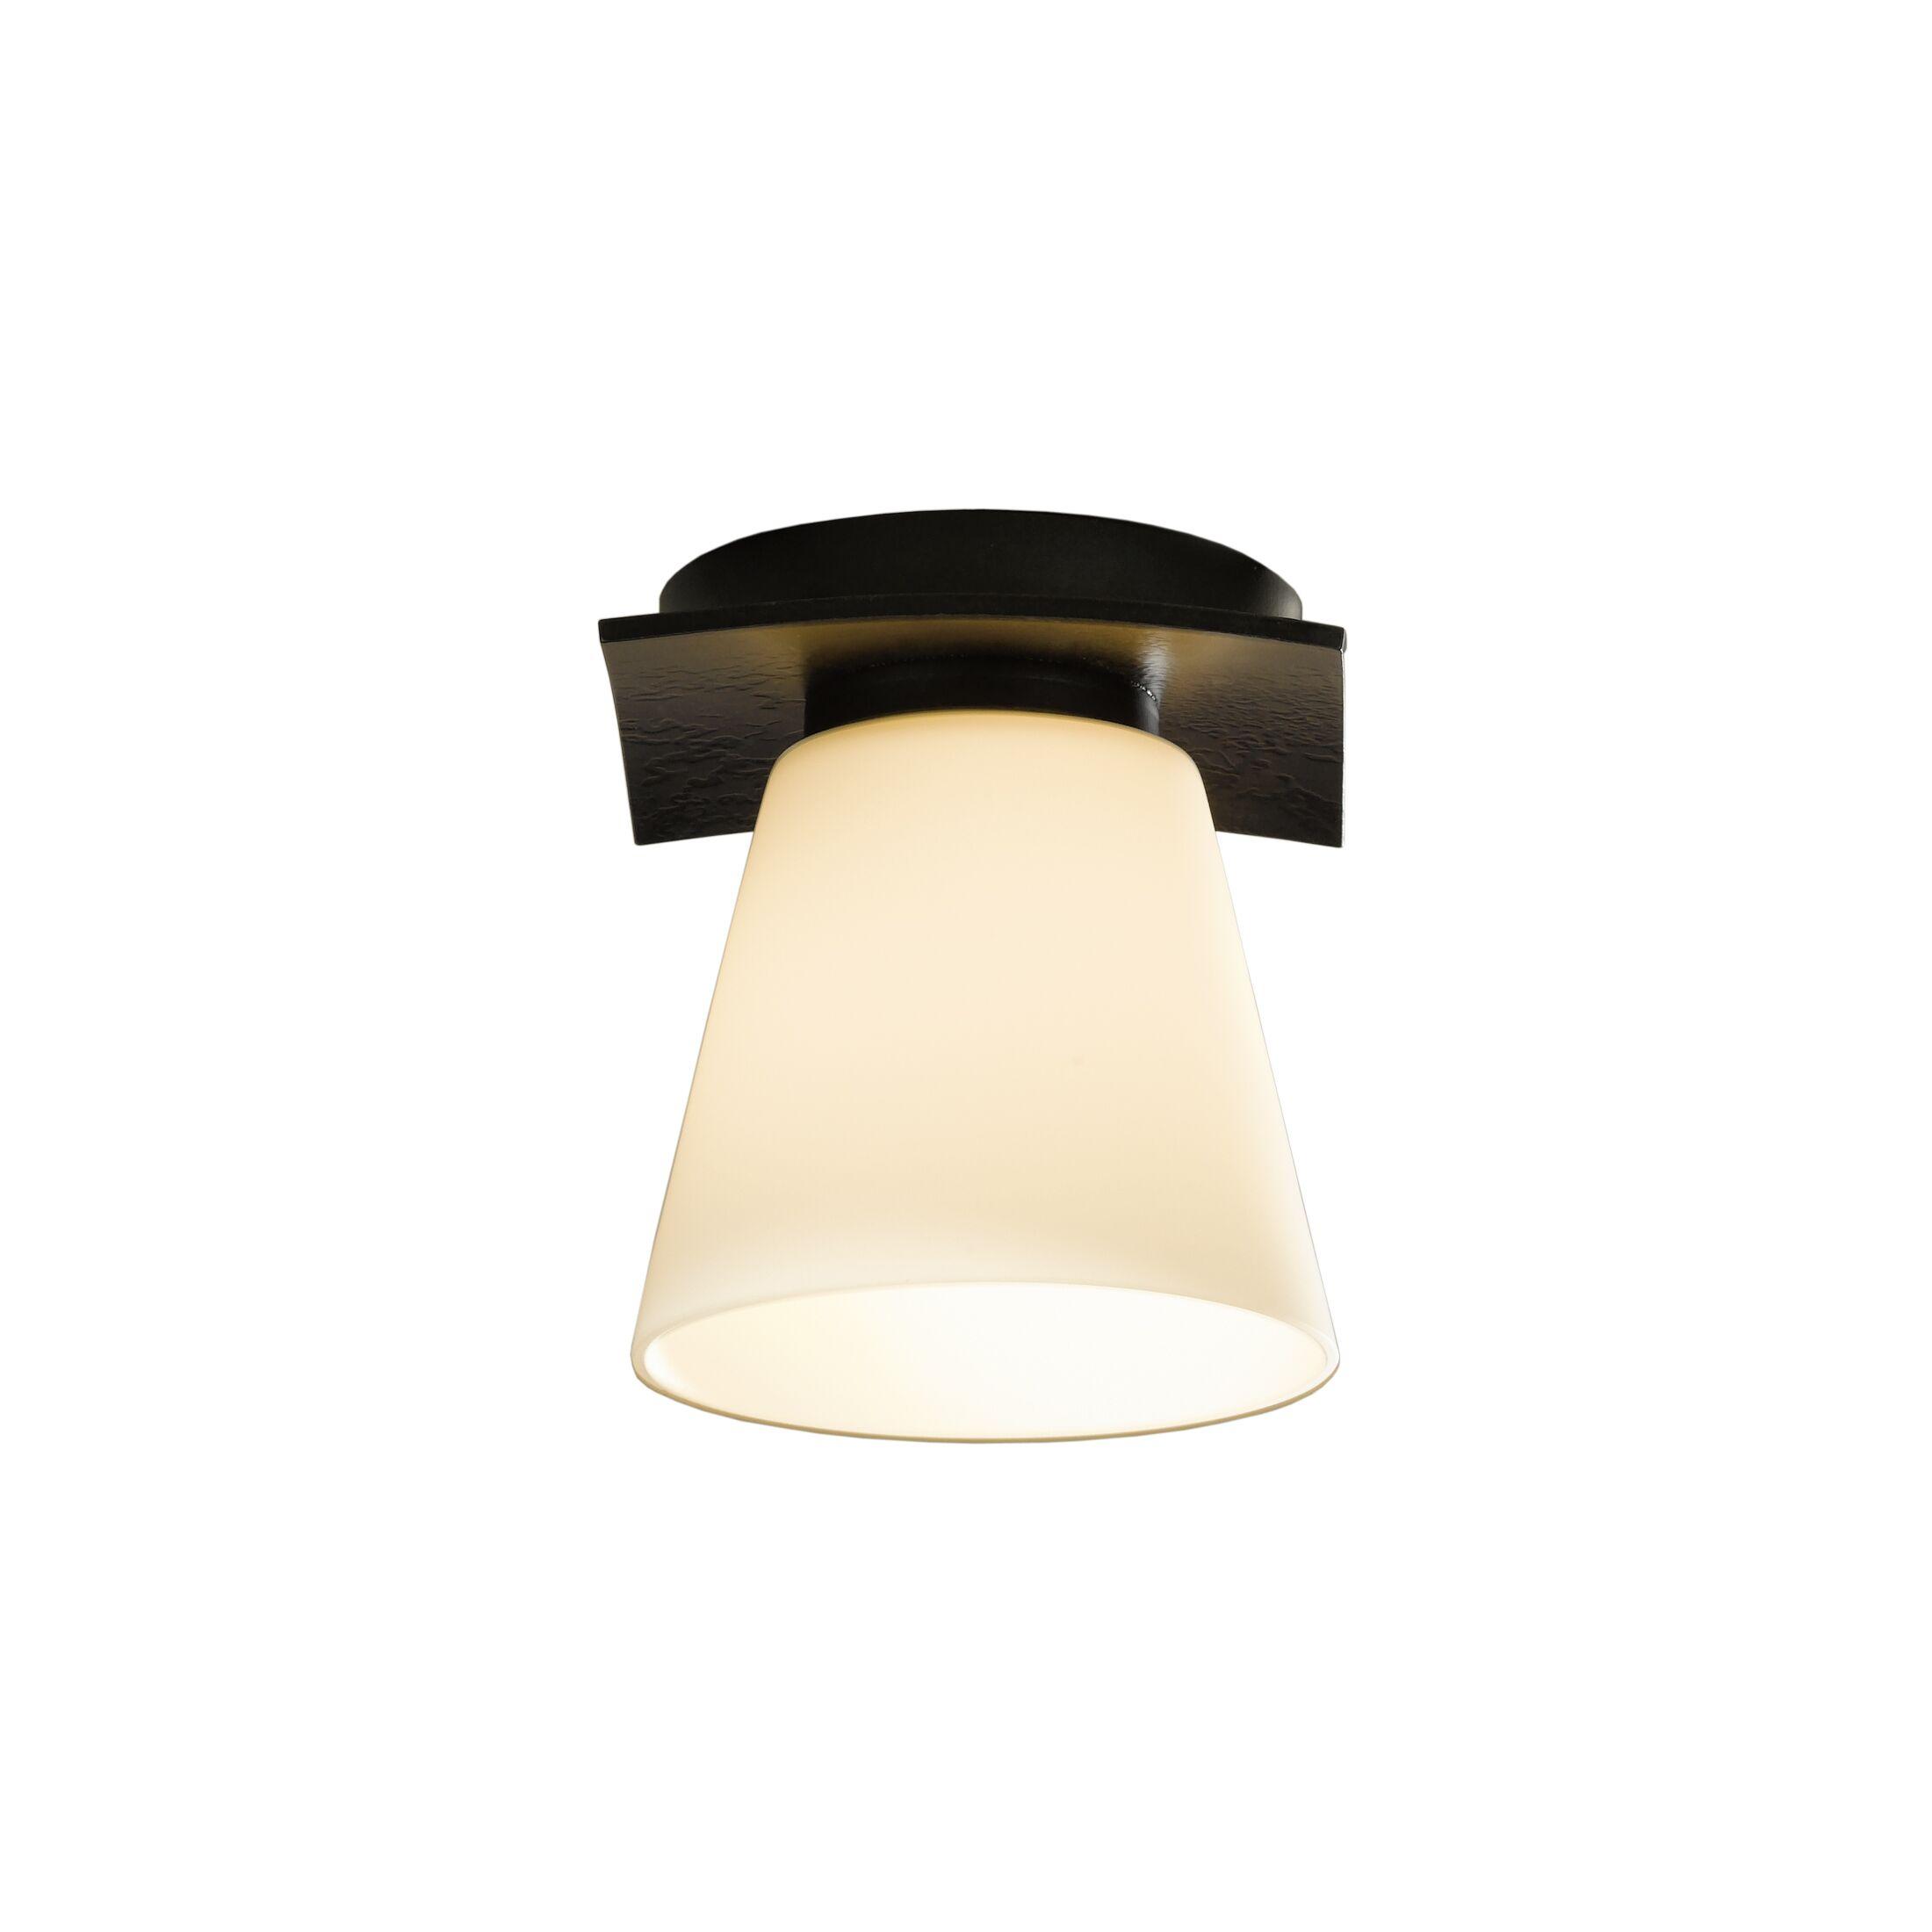 Wren 1-Light Semi Flush Mount Finish: Brushed Steel, Shade Color: Pearl, Bulb Type: (1) 60W G-9 halogen bulb